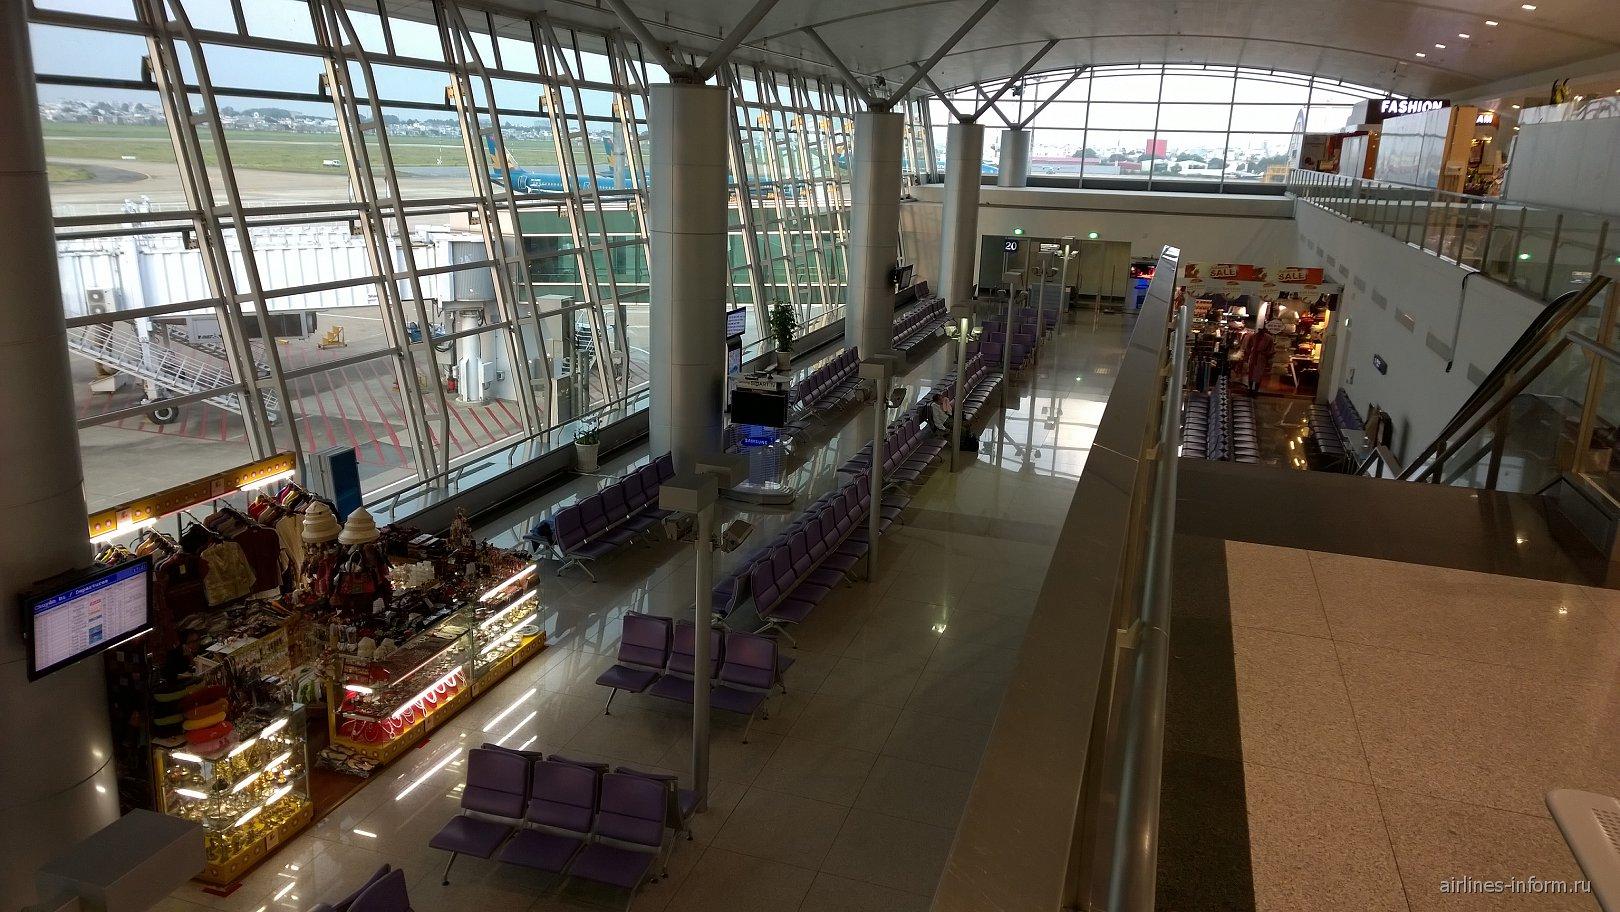 Зал ожидания перед выходами на посадку в аэропорту Хошимин Тан Сон Нхат